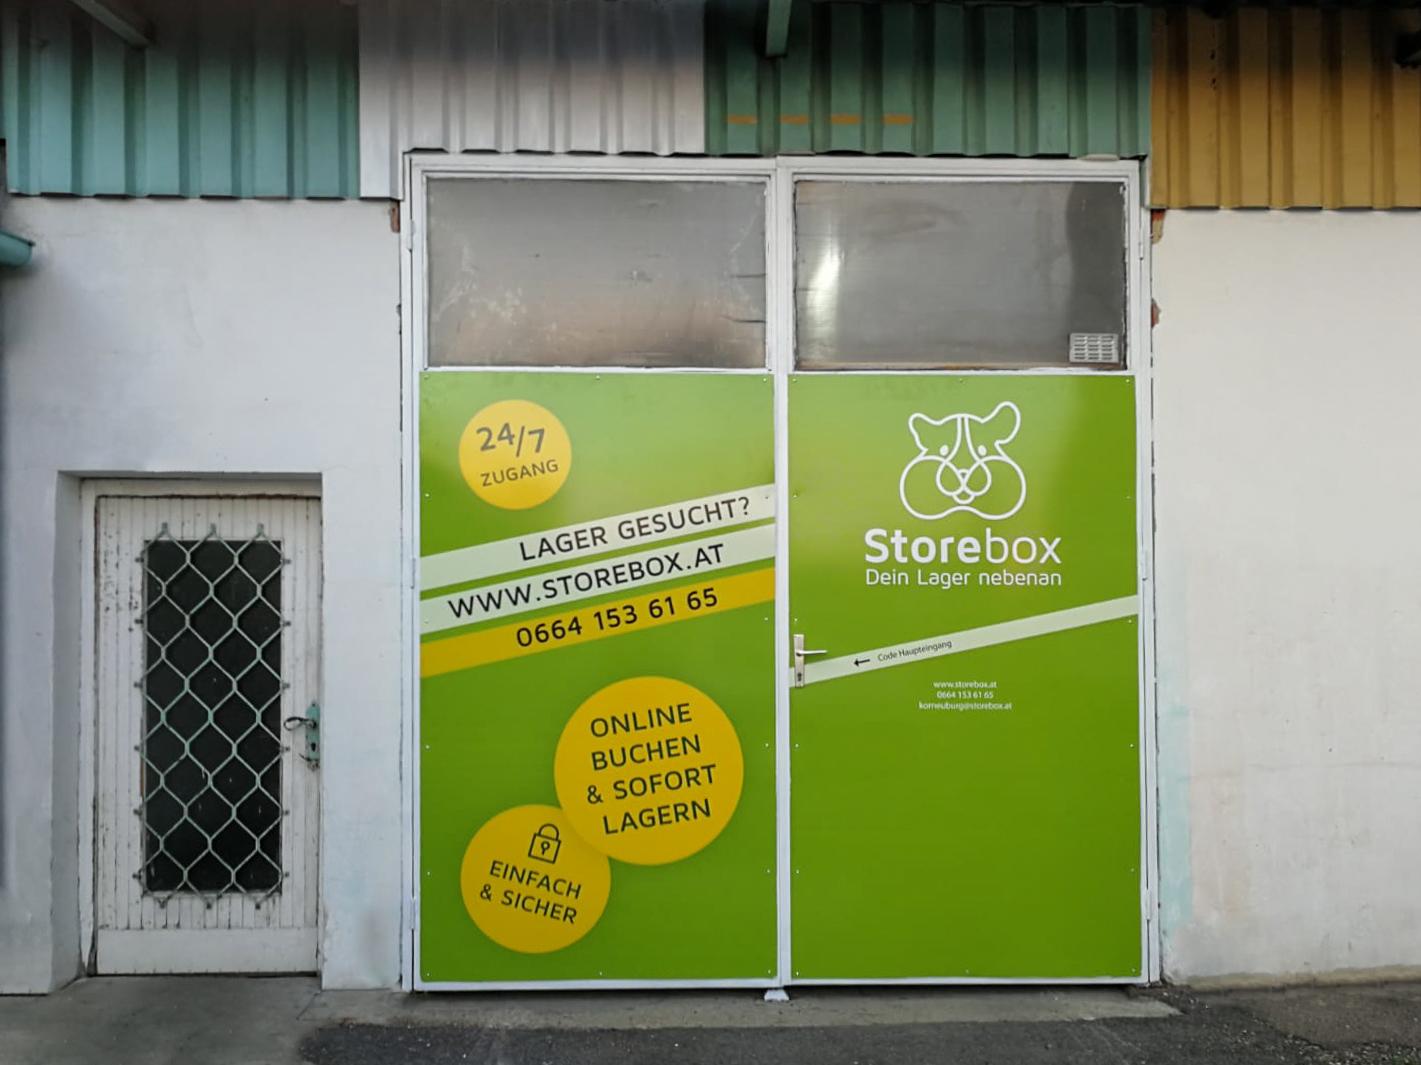 Storebox - Dein Lager nebenan